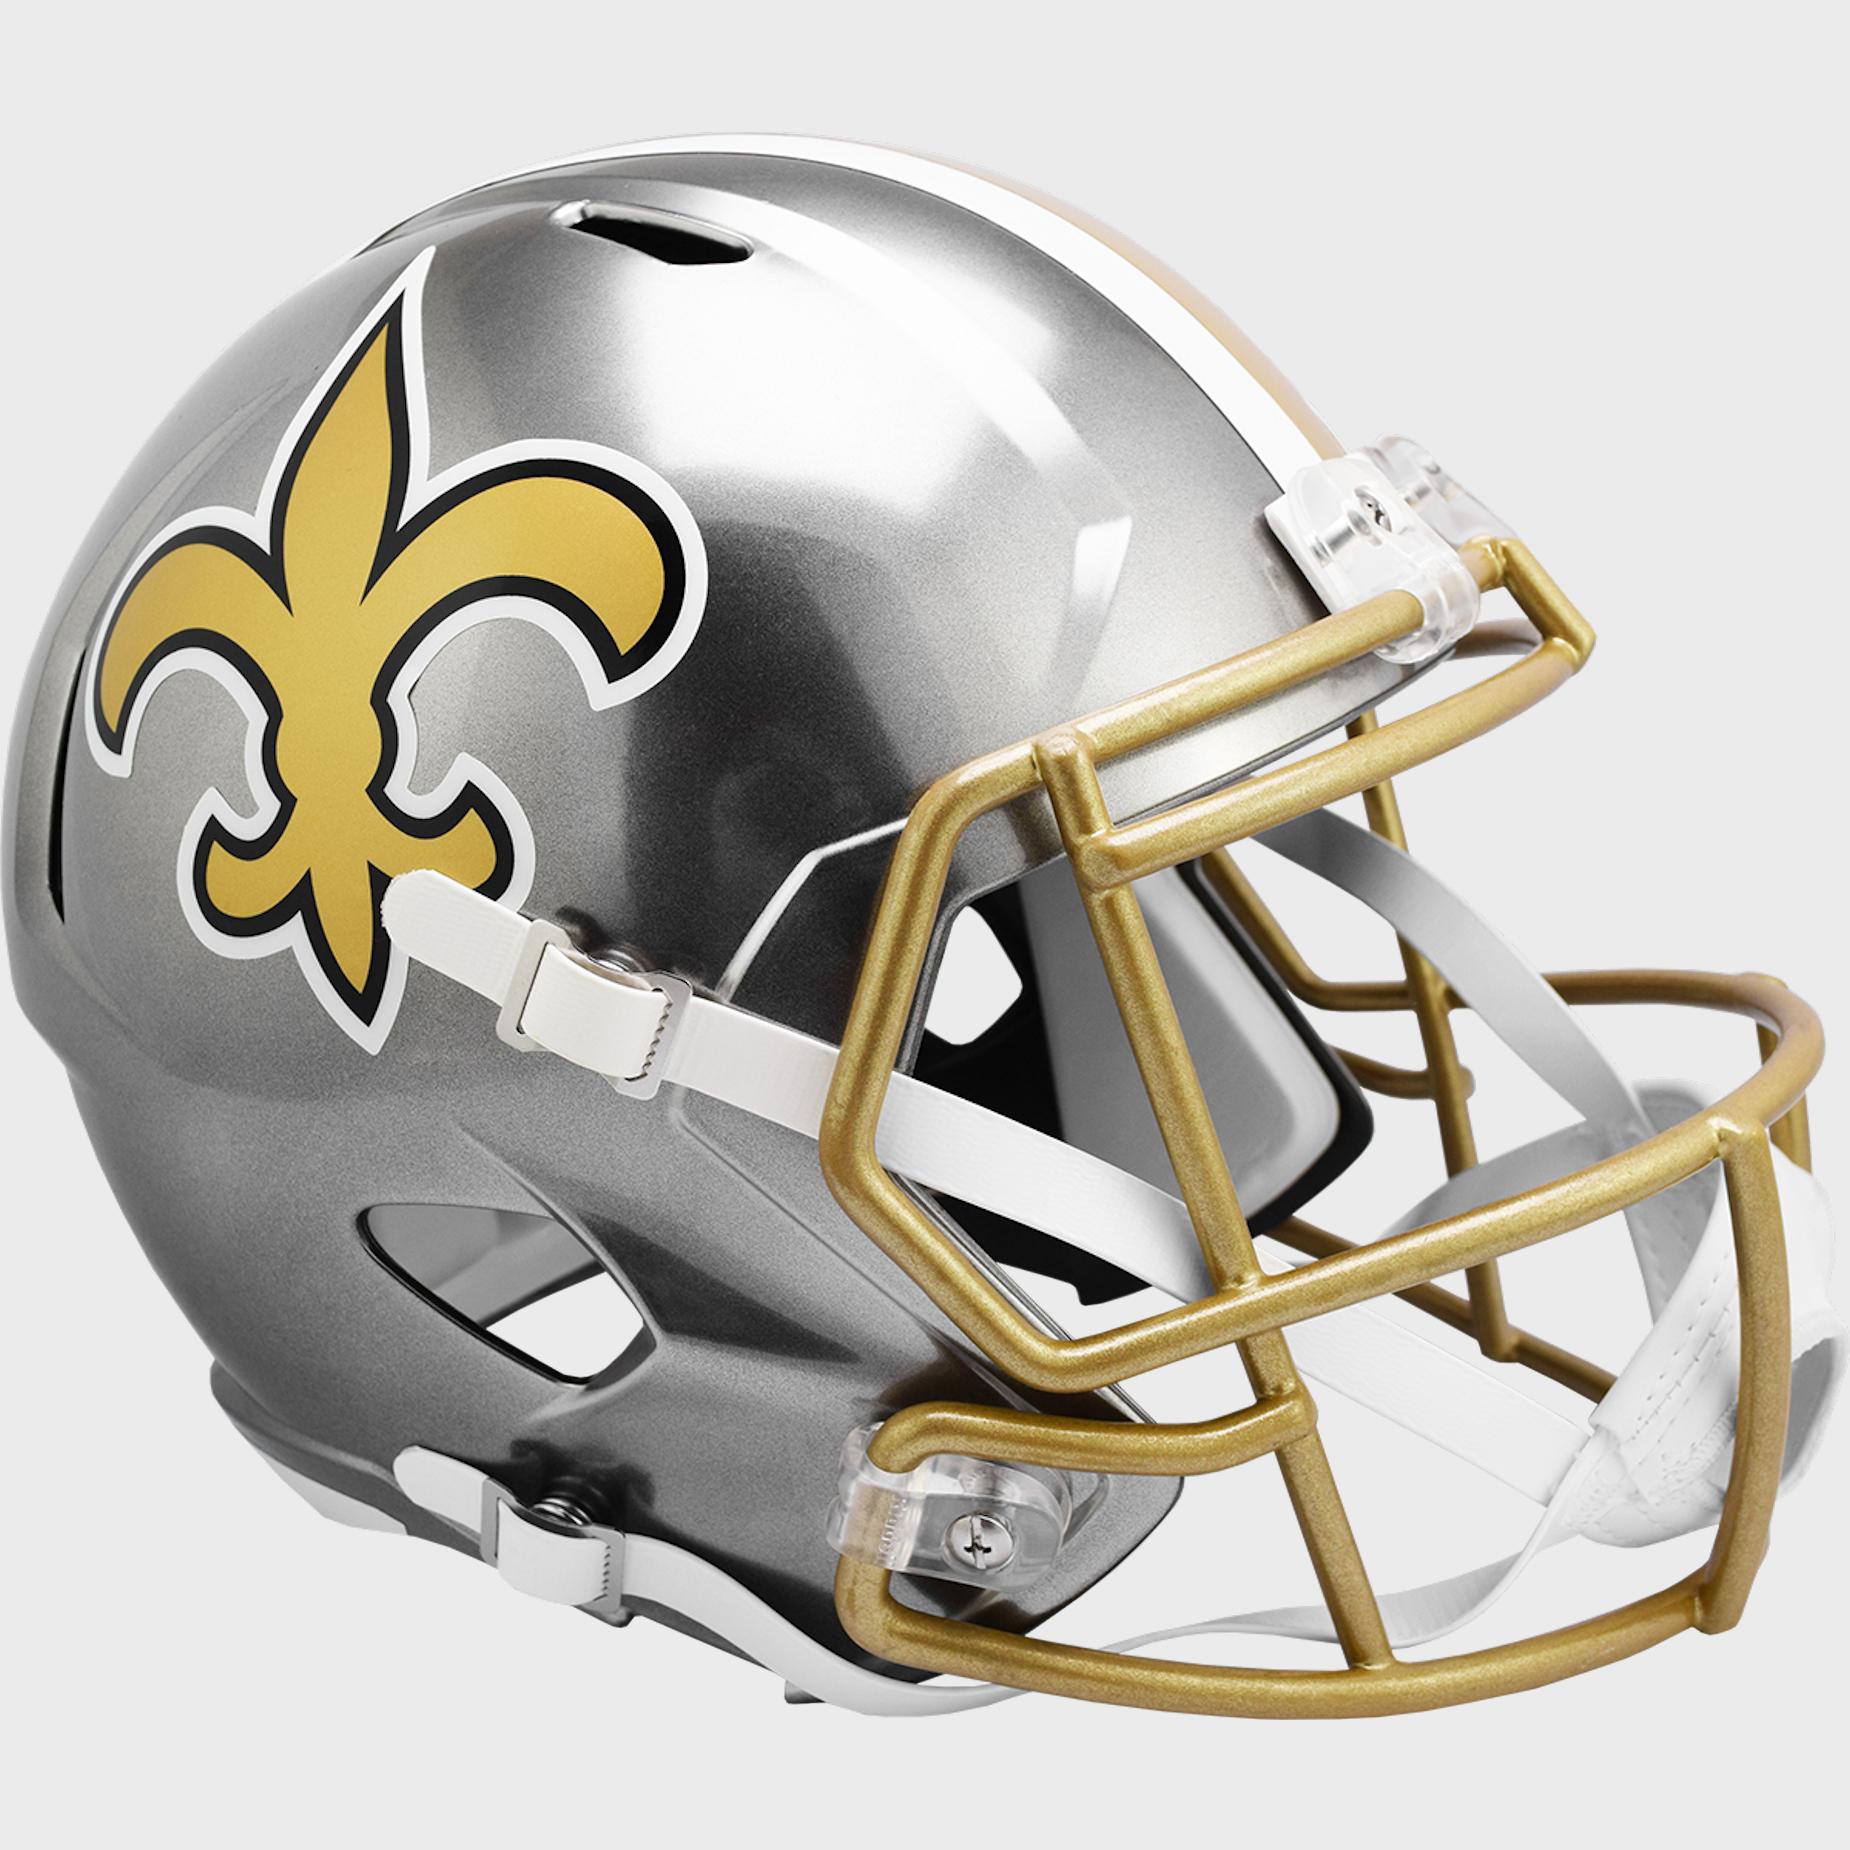 New Orleans Saints Speed Replica Football Helmet <B>FLASH ESD 8/21/21</B>